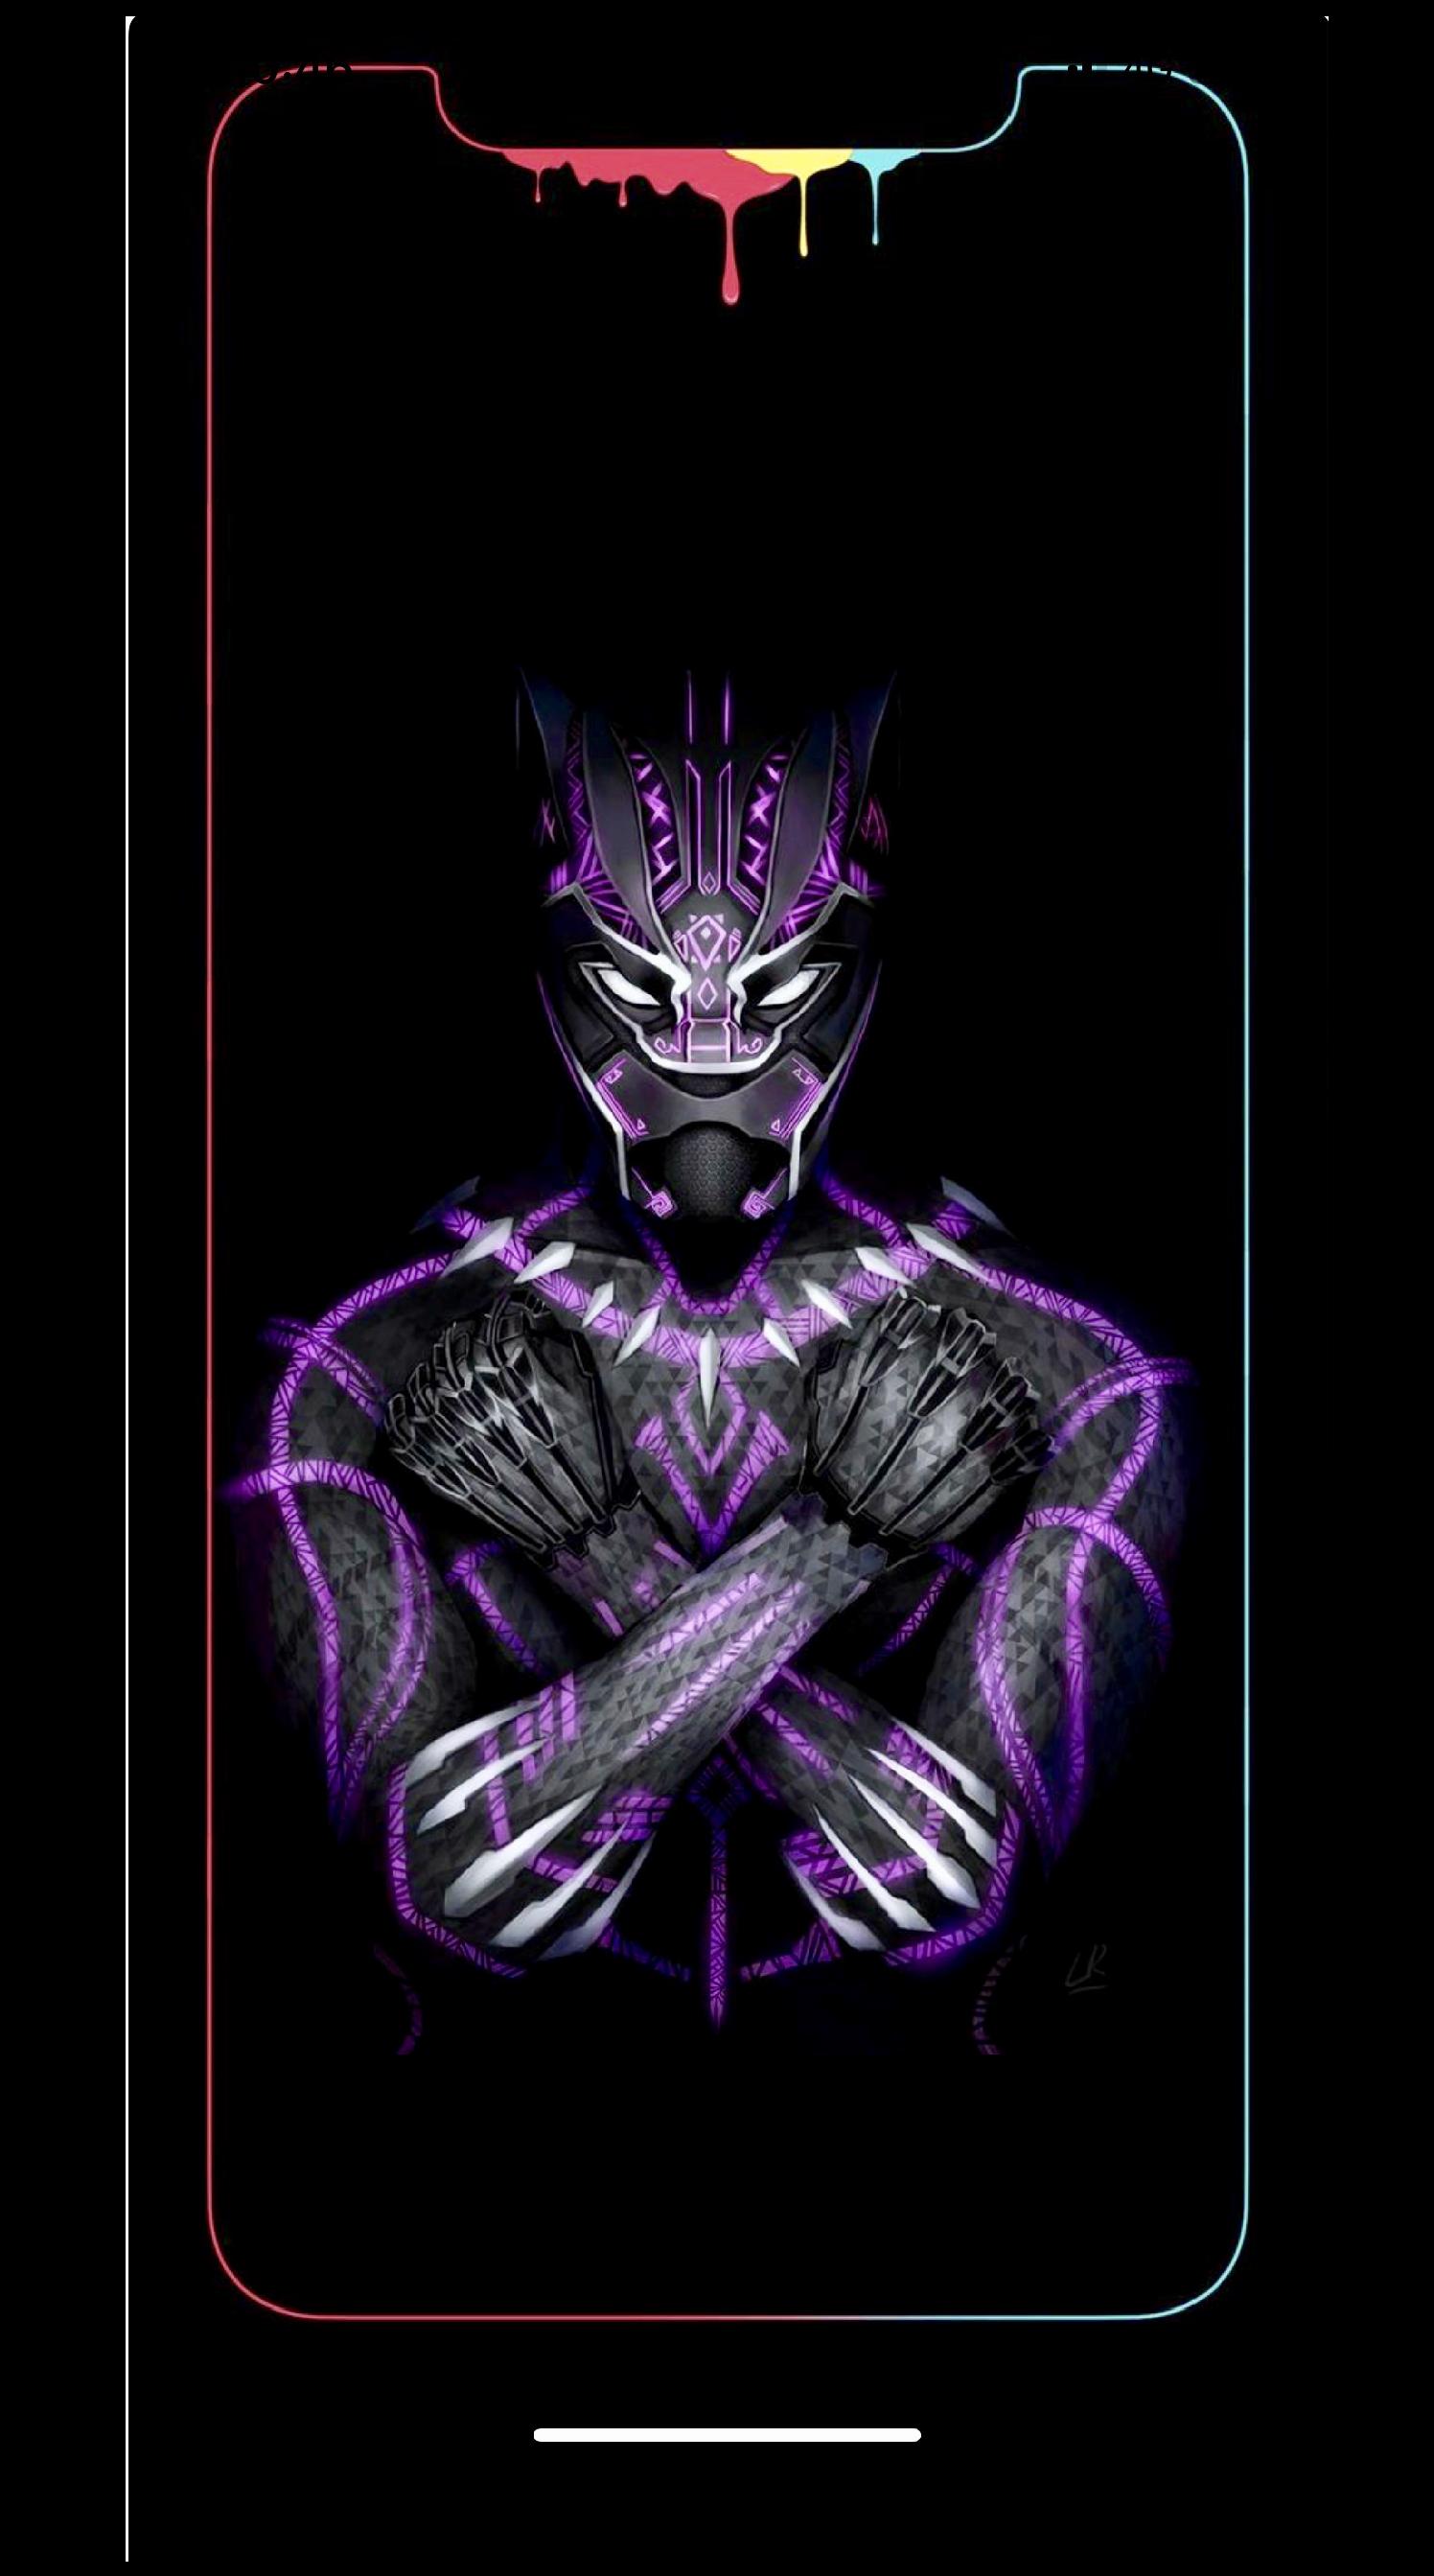 Black panther Wallpaper iPhone XS Mas Marvel wallpaper